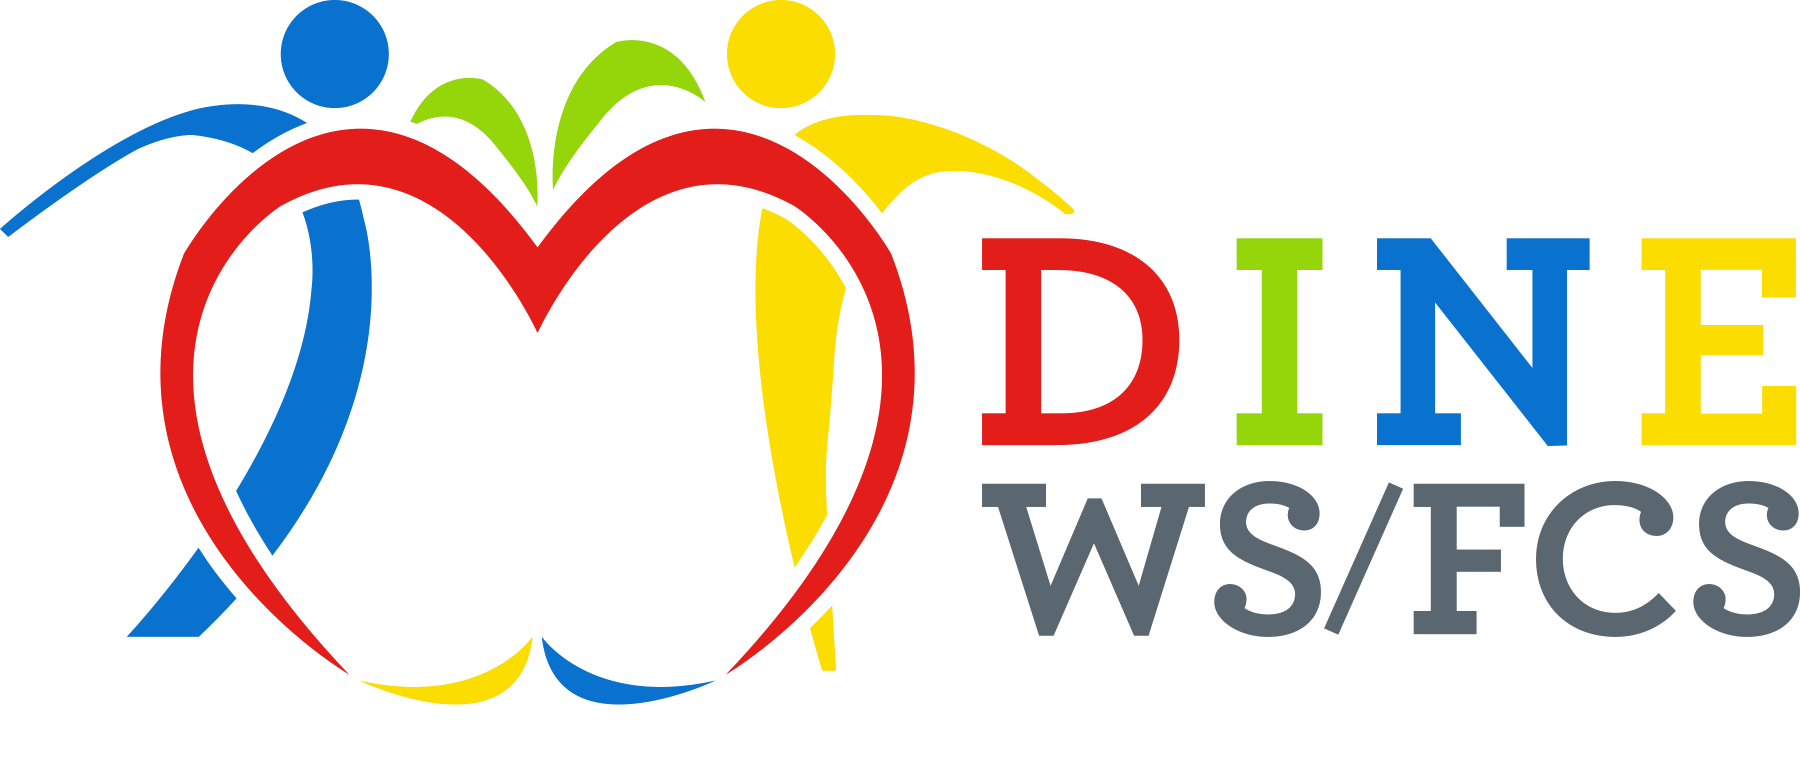 Winston-Salem/Forsyth County Schools logo